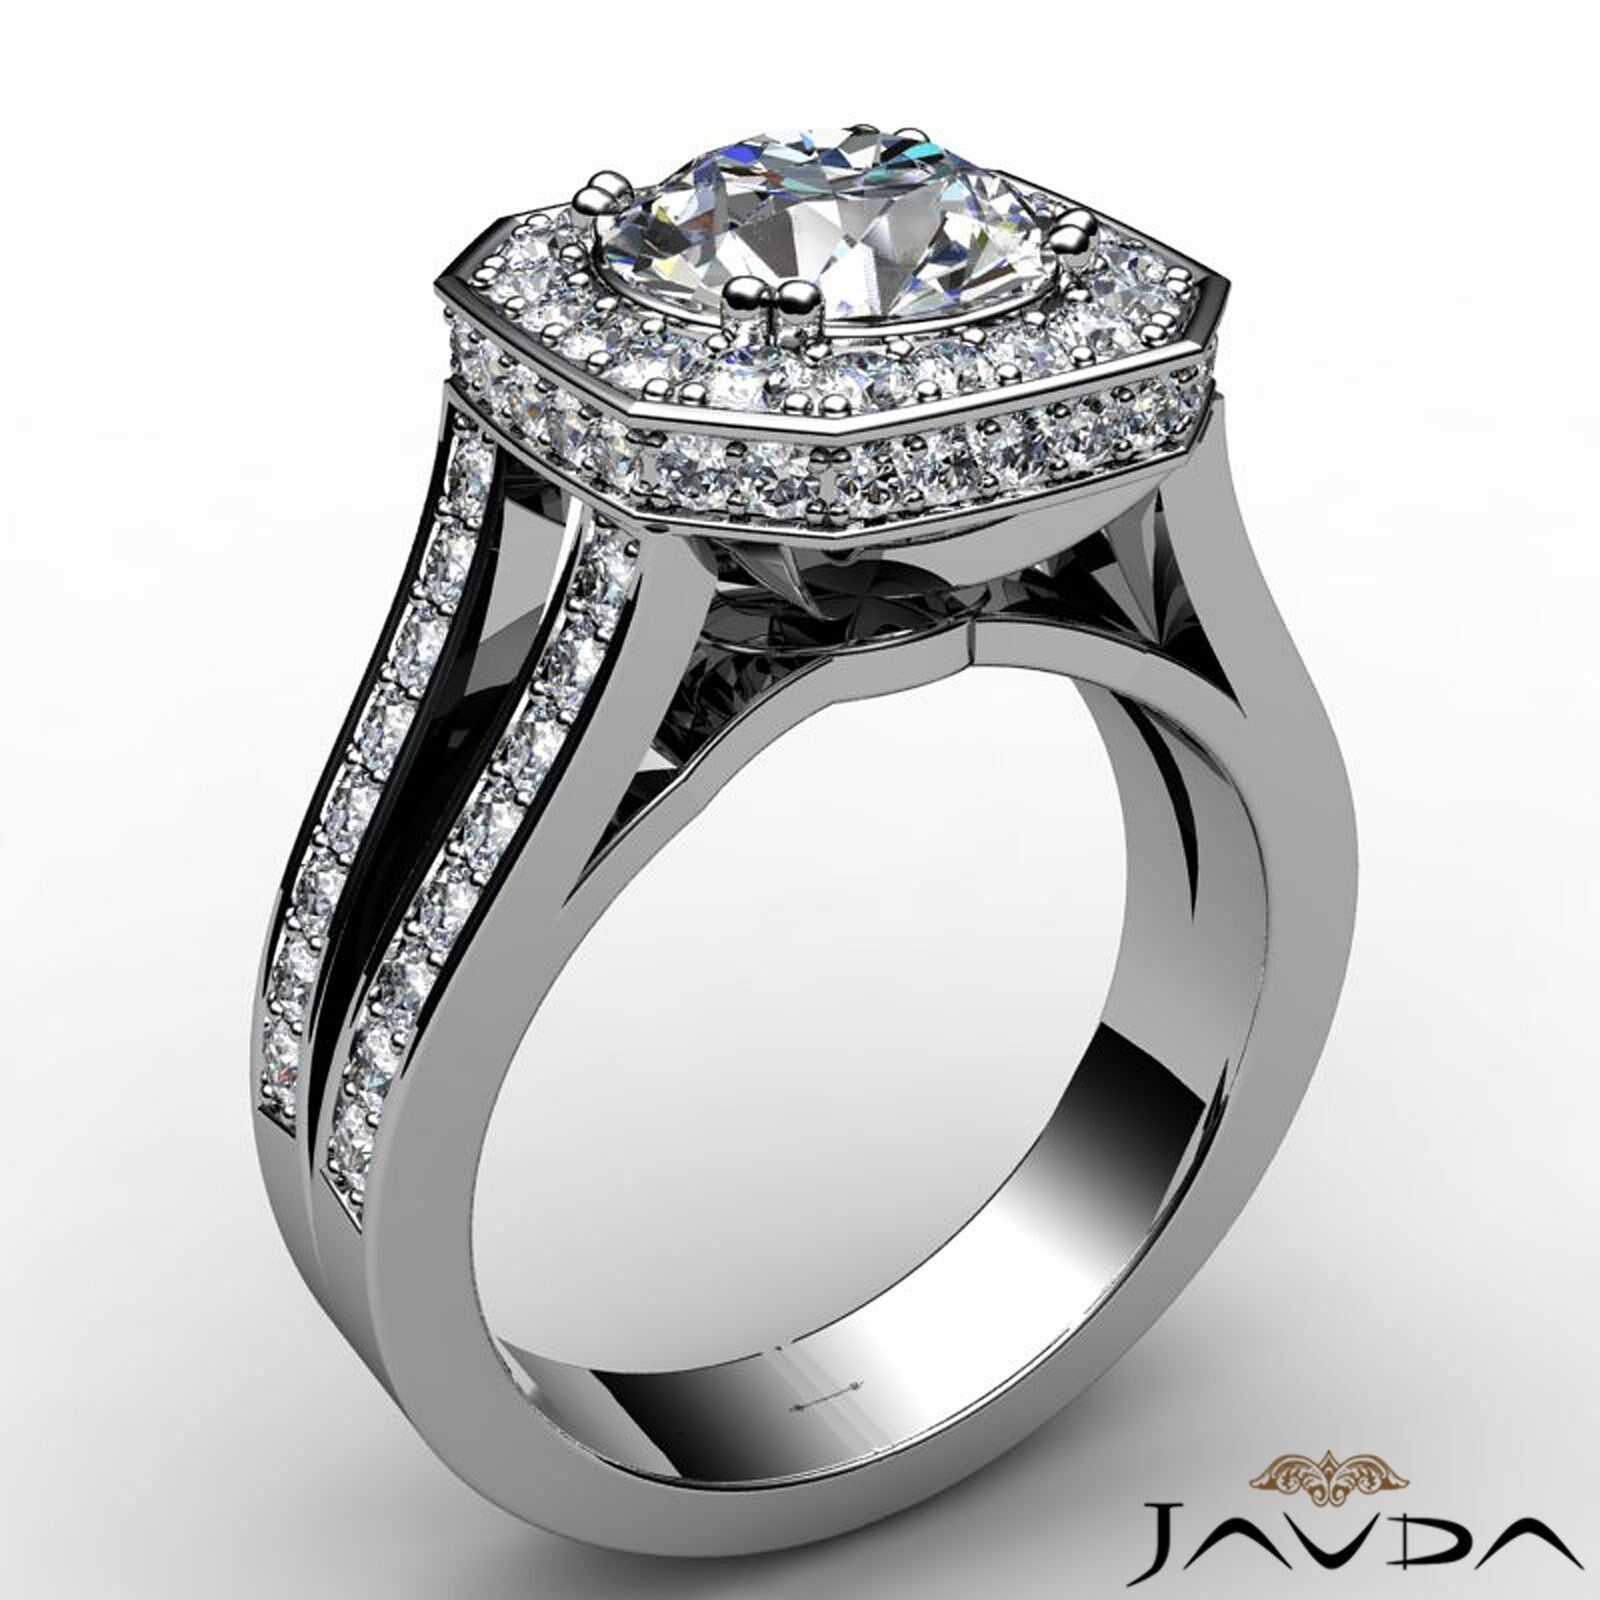 Hexagon Halo Split Shank Round Diamond Engagement Ring GIA F VS1 Clarity 2.84Ct 1